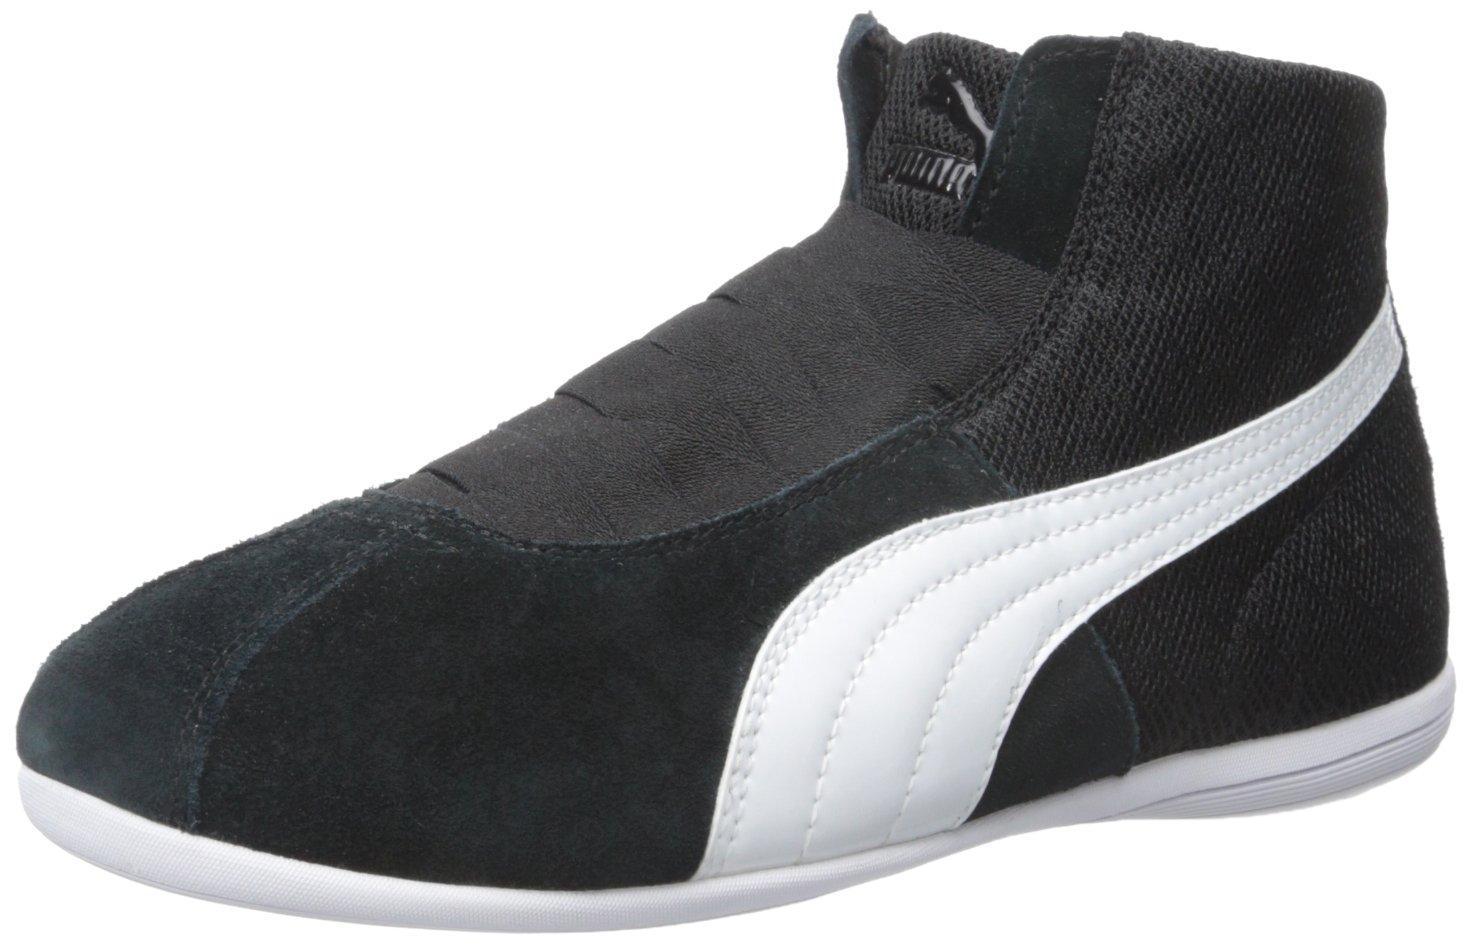 PUMA Women's Eskiva Mid Textured Cross-Trainer Shoe, Black, 7 M US by PUMA (Image #1)